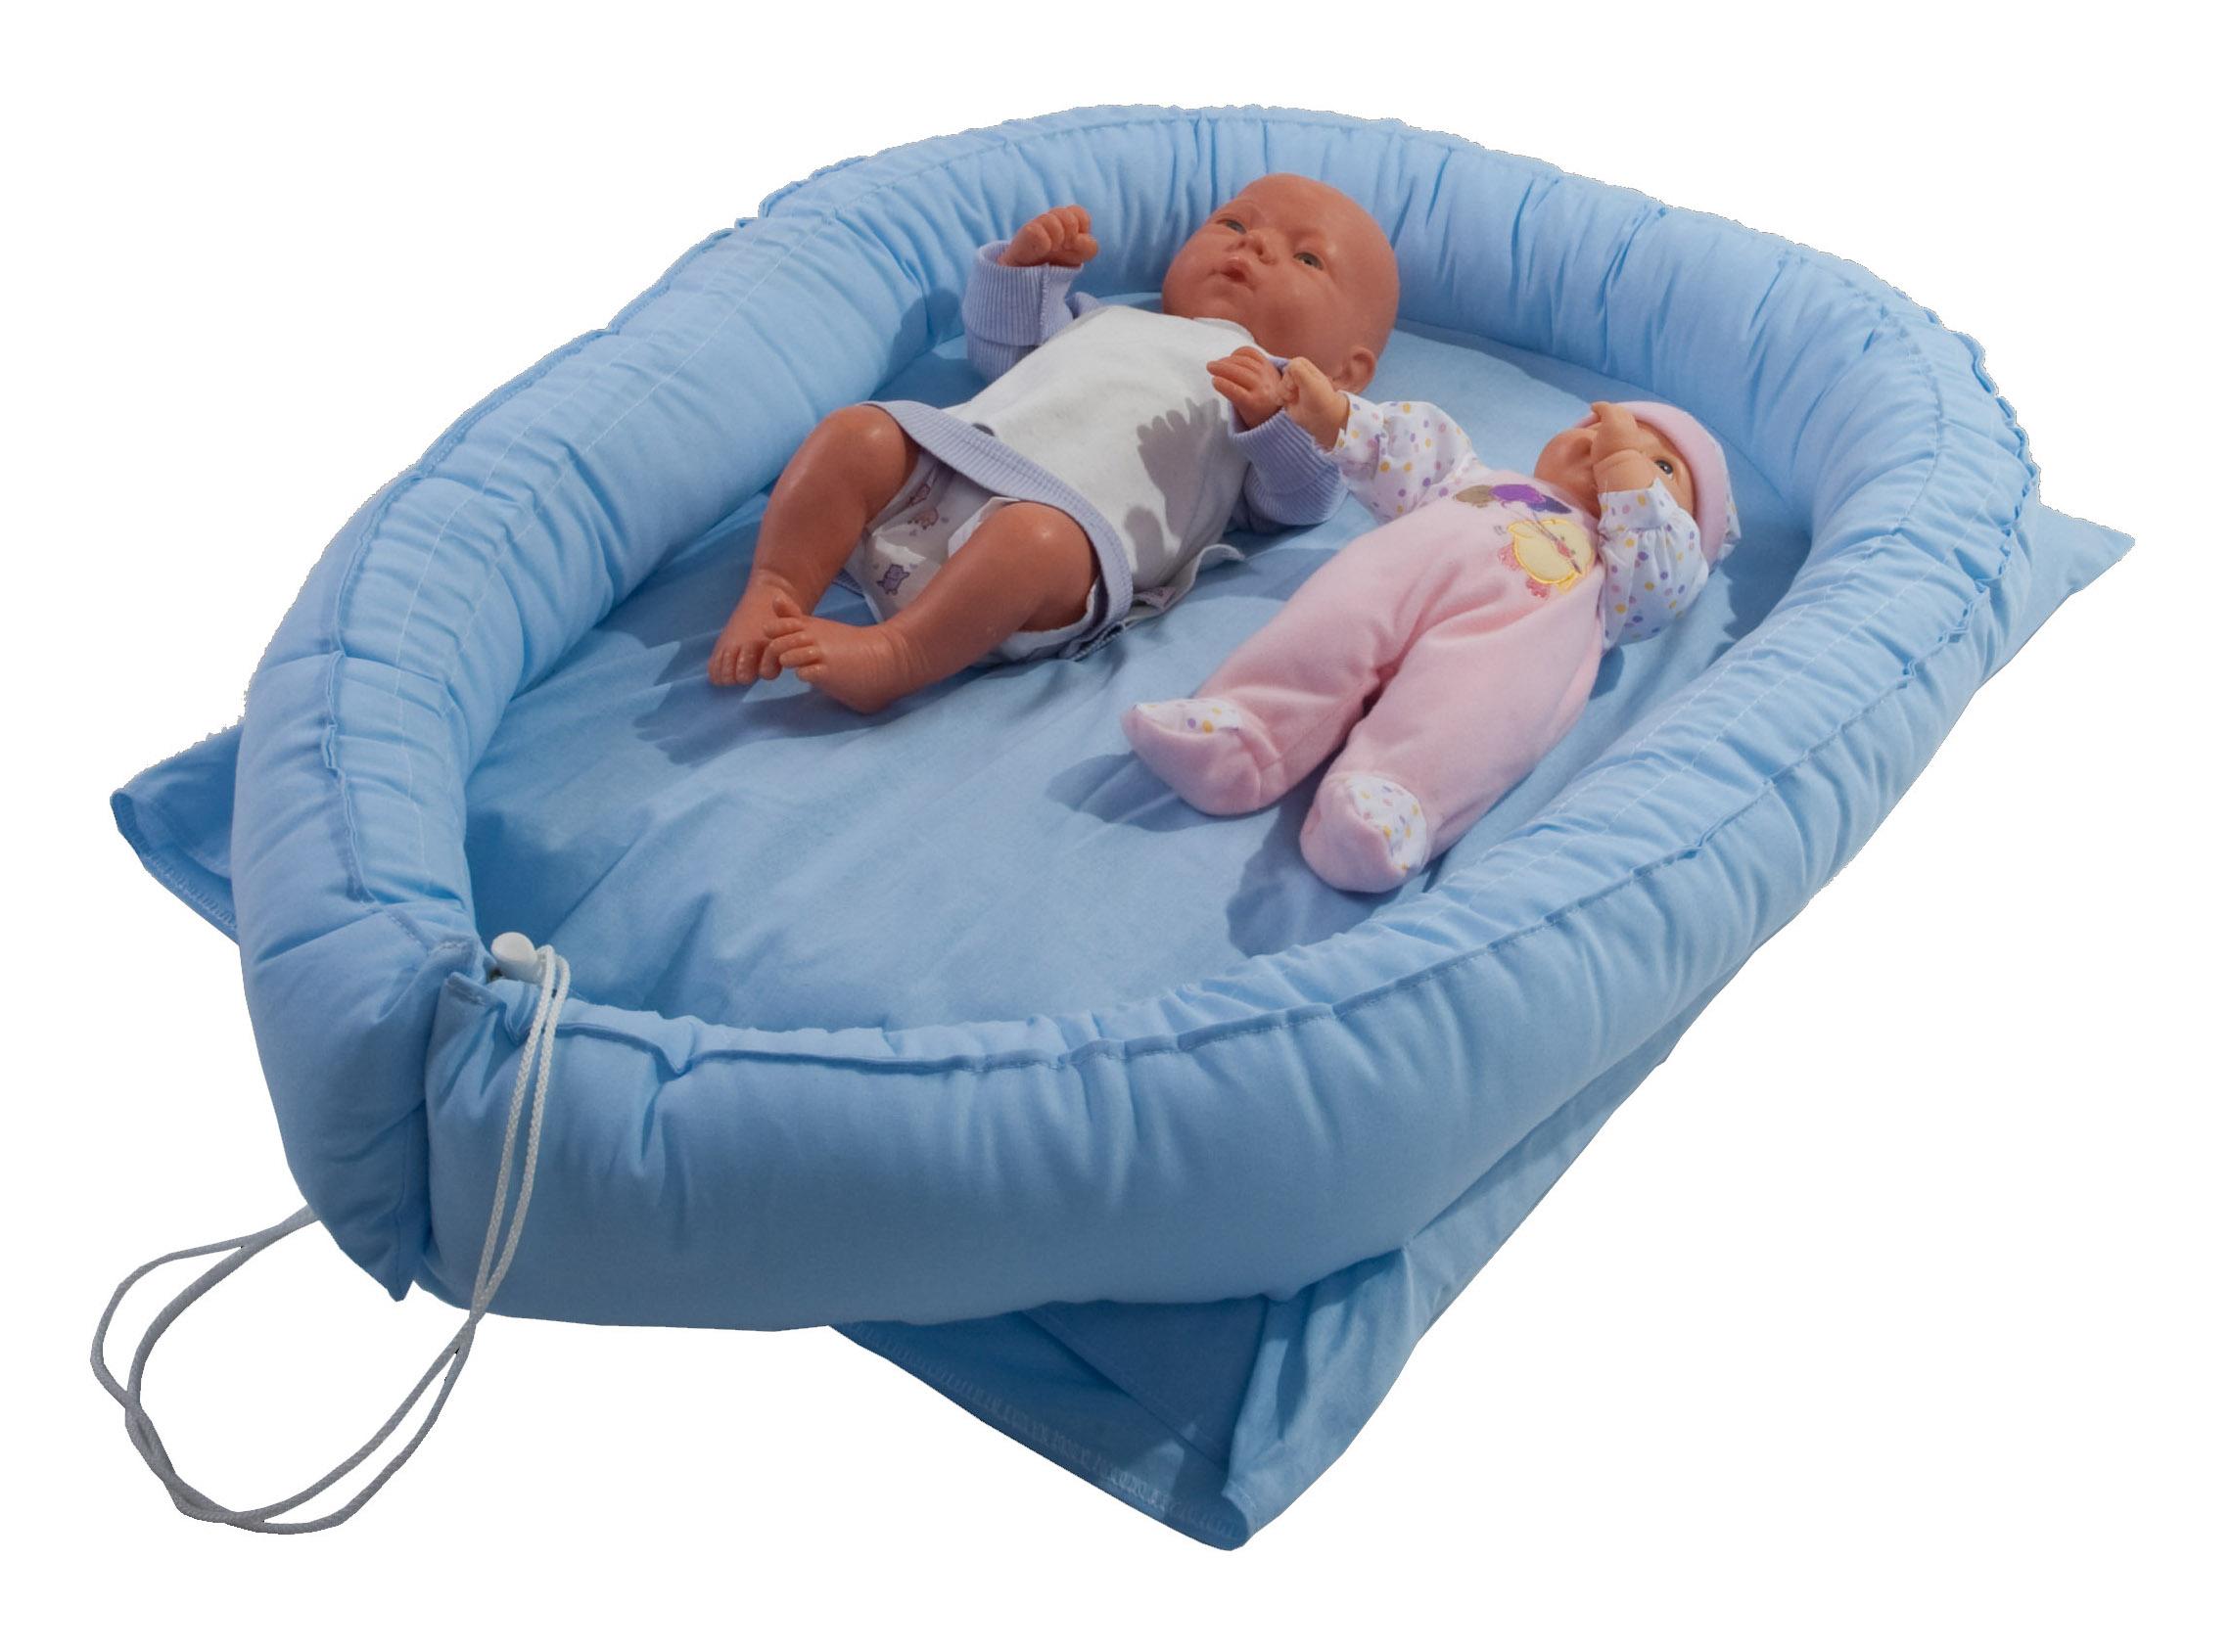 Kanmed Kanmed Baby Nest For Twins Kanmed